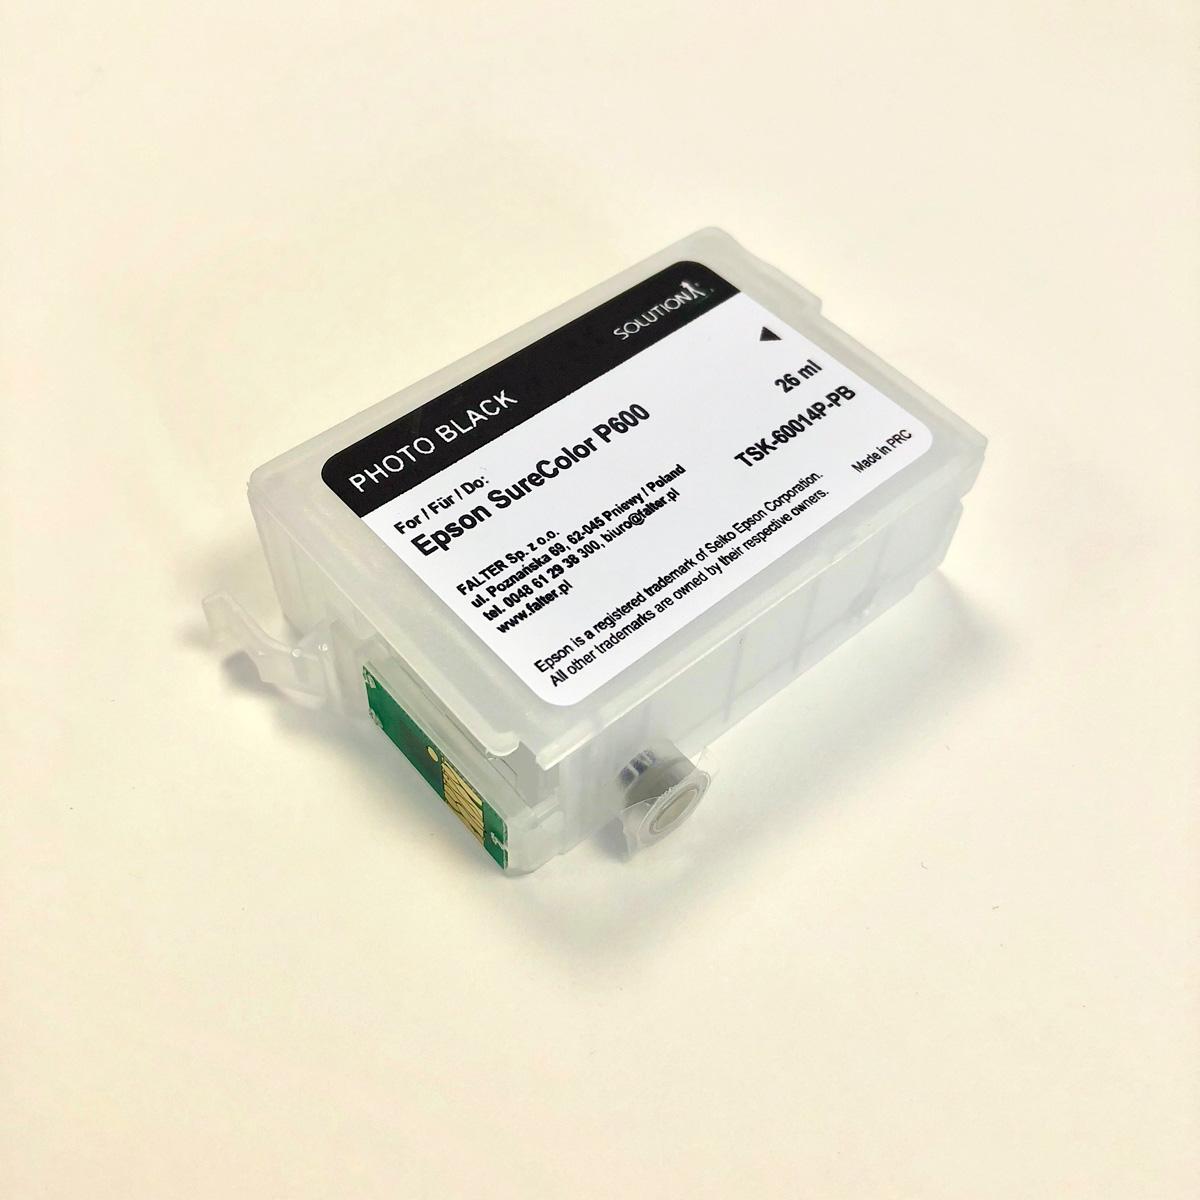 Refillable cartridges for Epson SC-P600